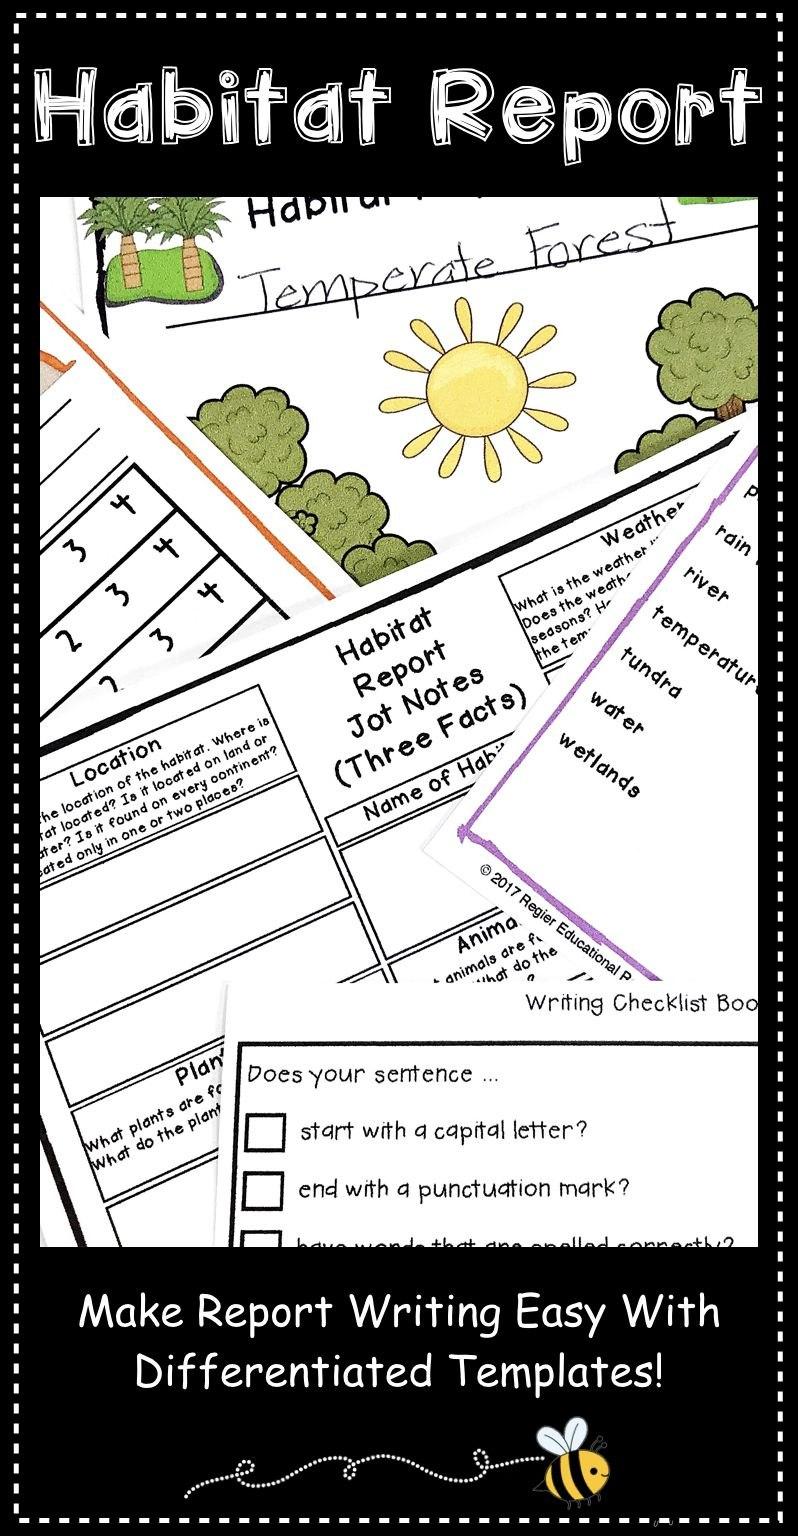 Informative Writing Templates  Habitat Research  Habitat With Research Project Report Template